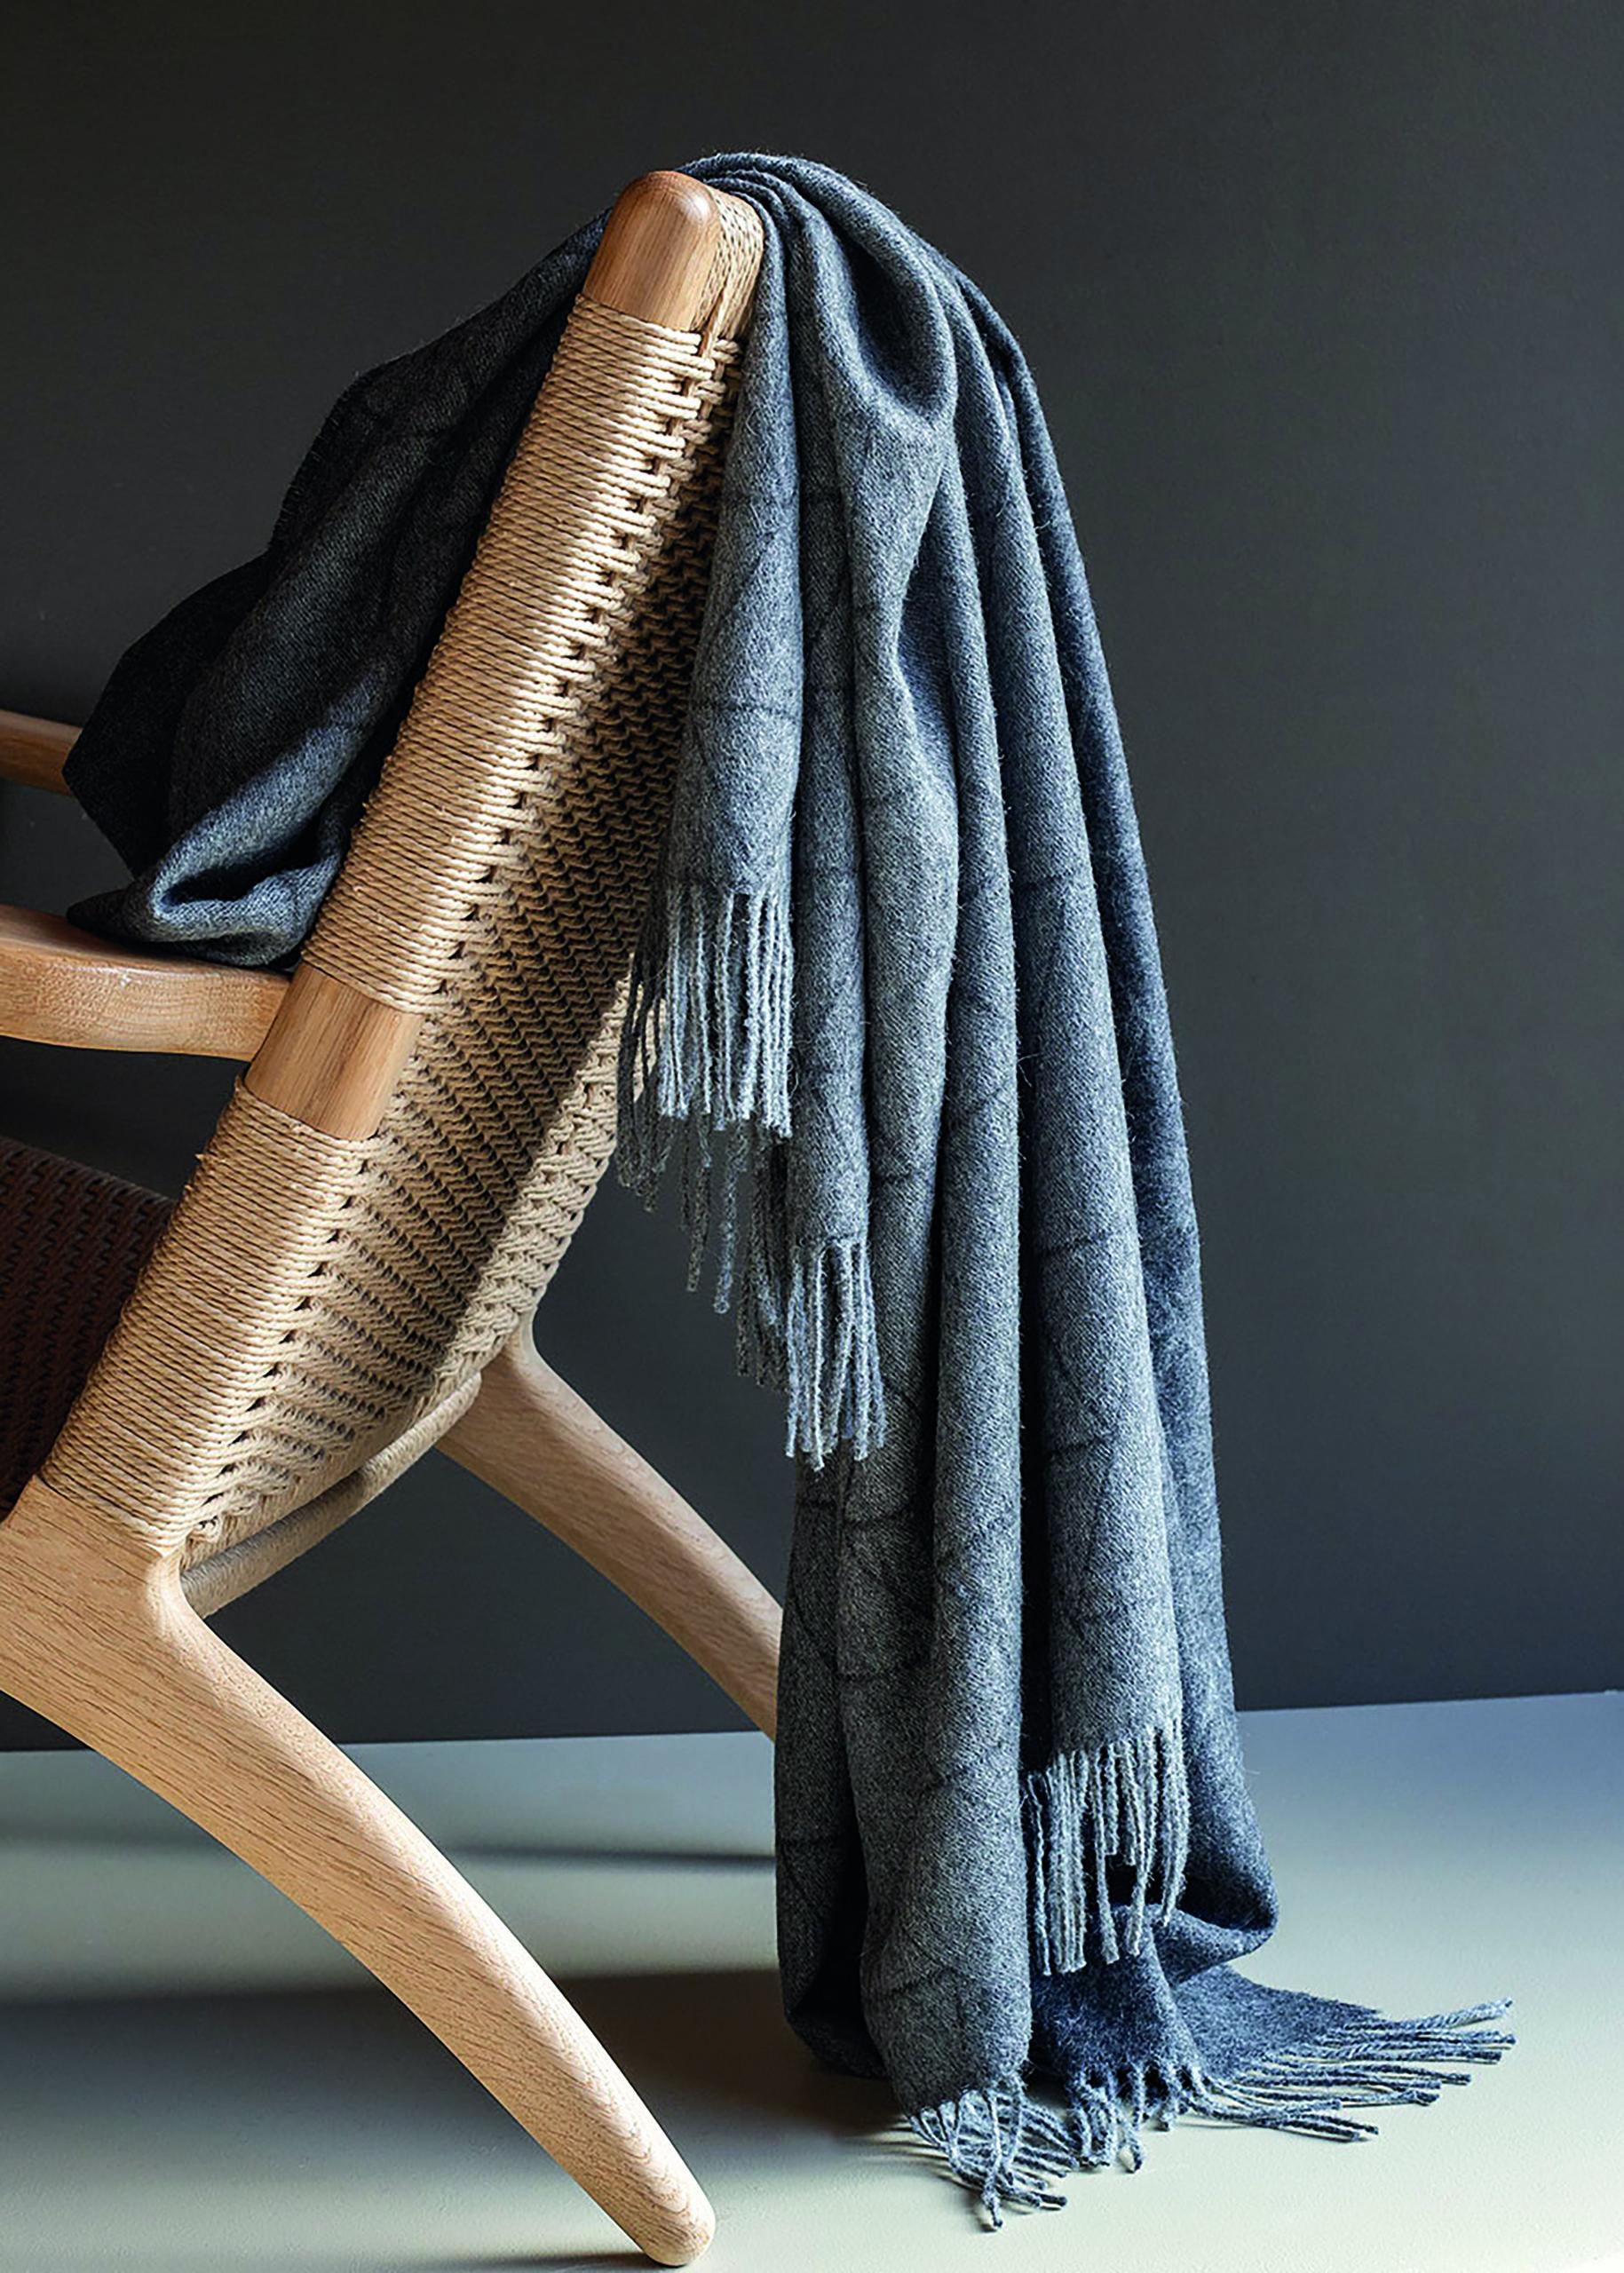 Architectmade-FJ-Pattern-Throw-Baby-Alpaca-Wool-Denmark-Finn-Juhl-3